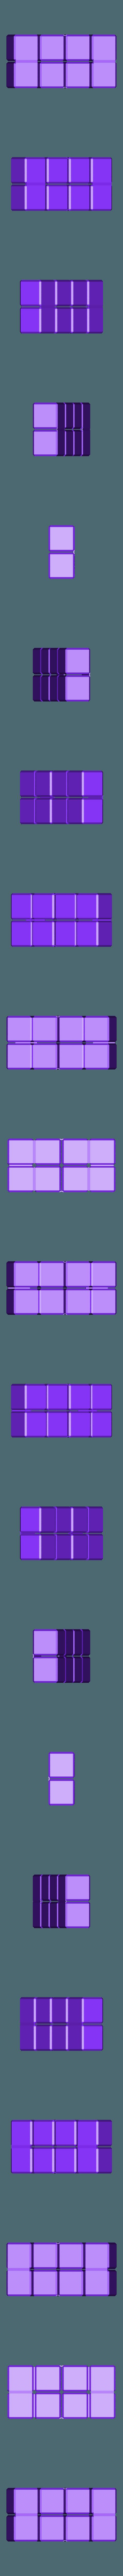 FlexibleCube25.stl Download free STL file Infinity Cube, Magic Cube, Flexible Cube, Folding Cube for Flexible TPU filament • 3D printing template, LGBU